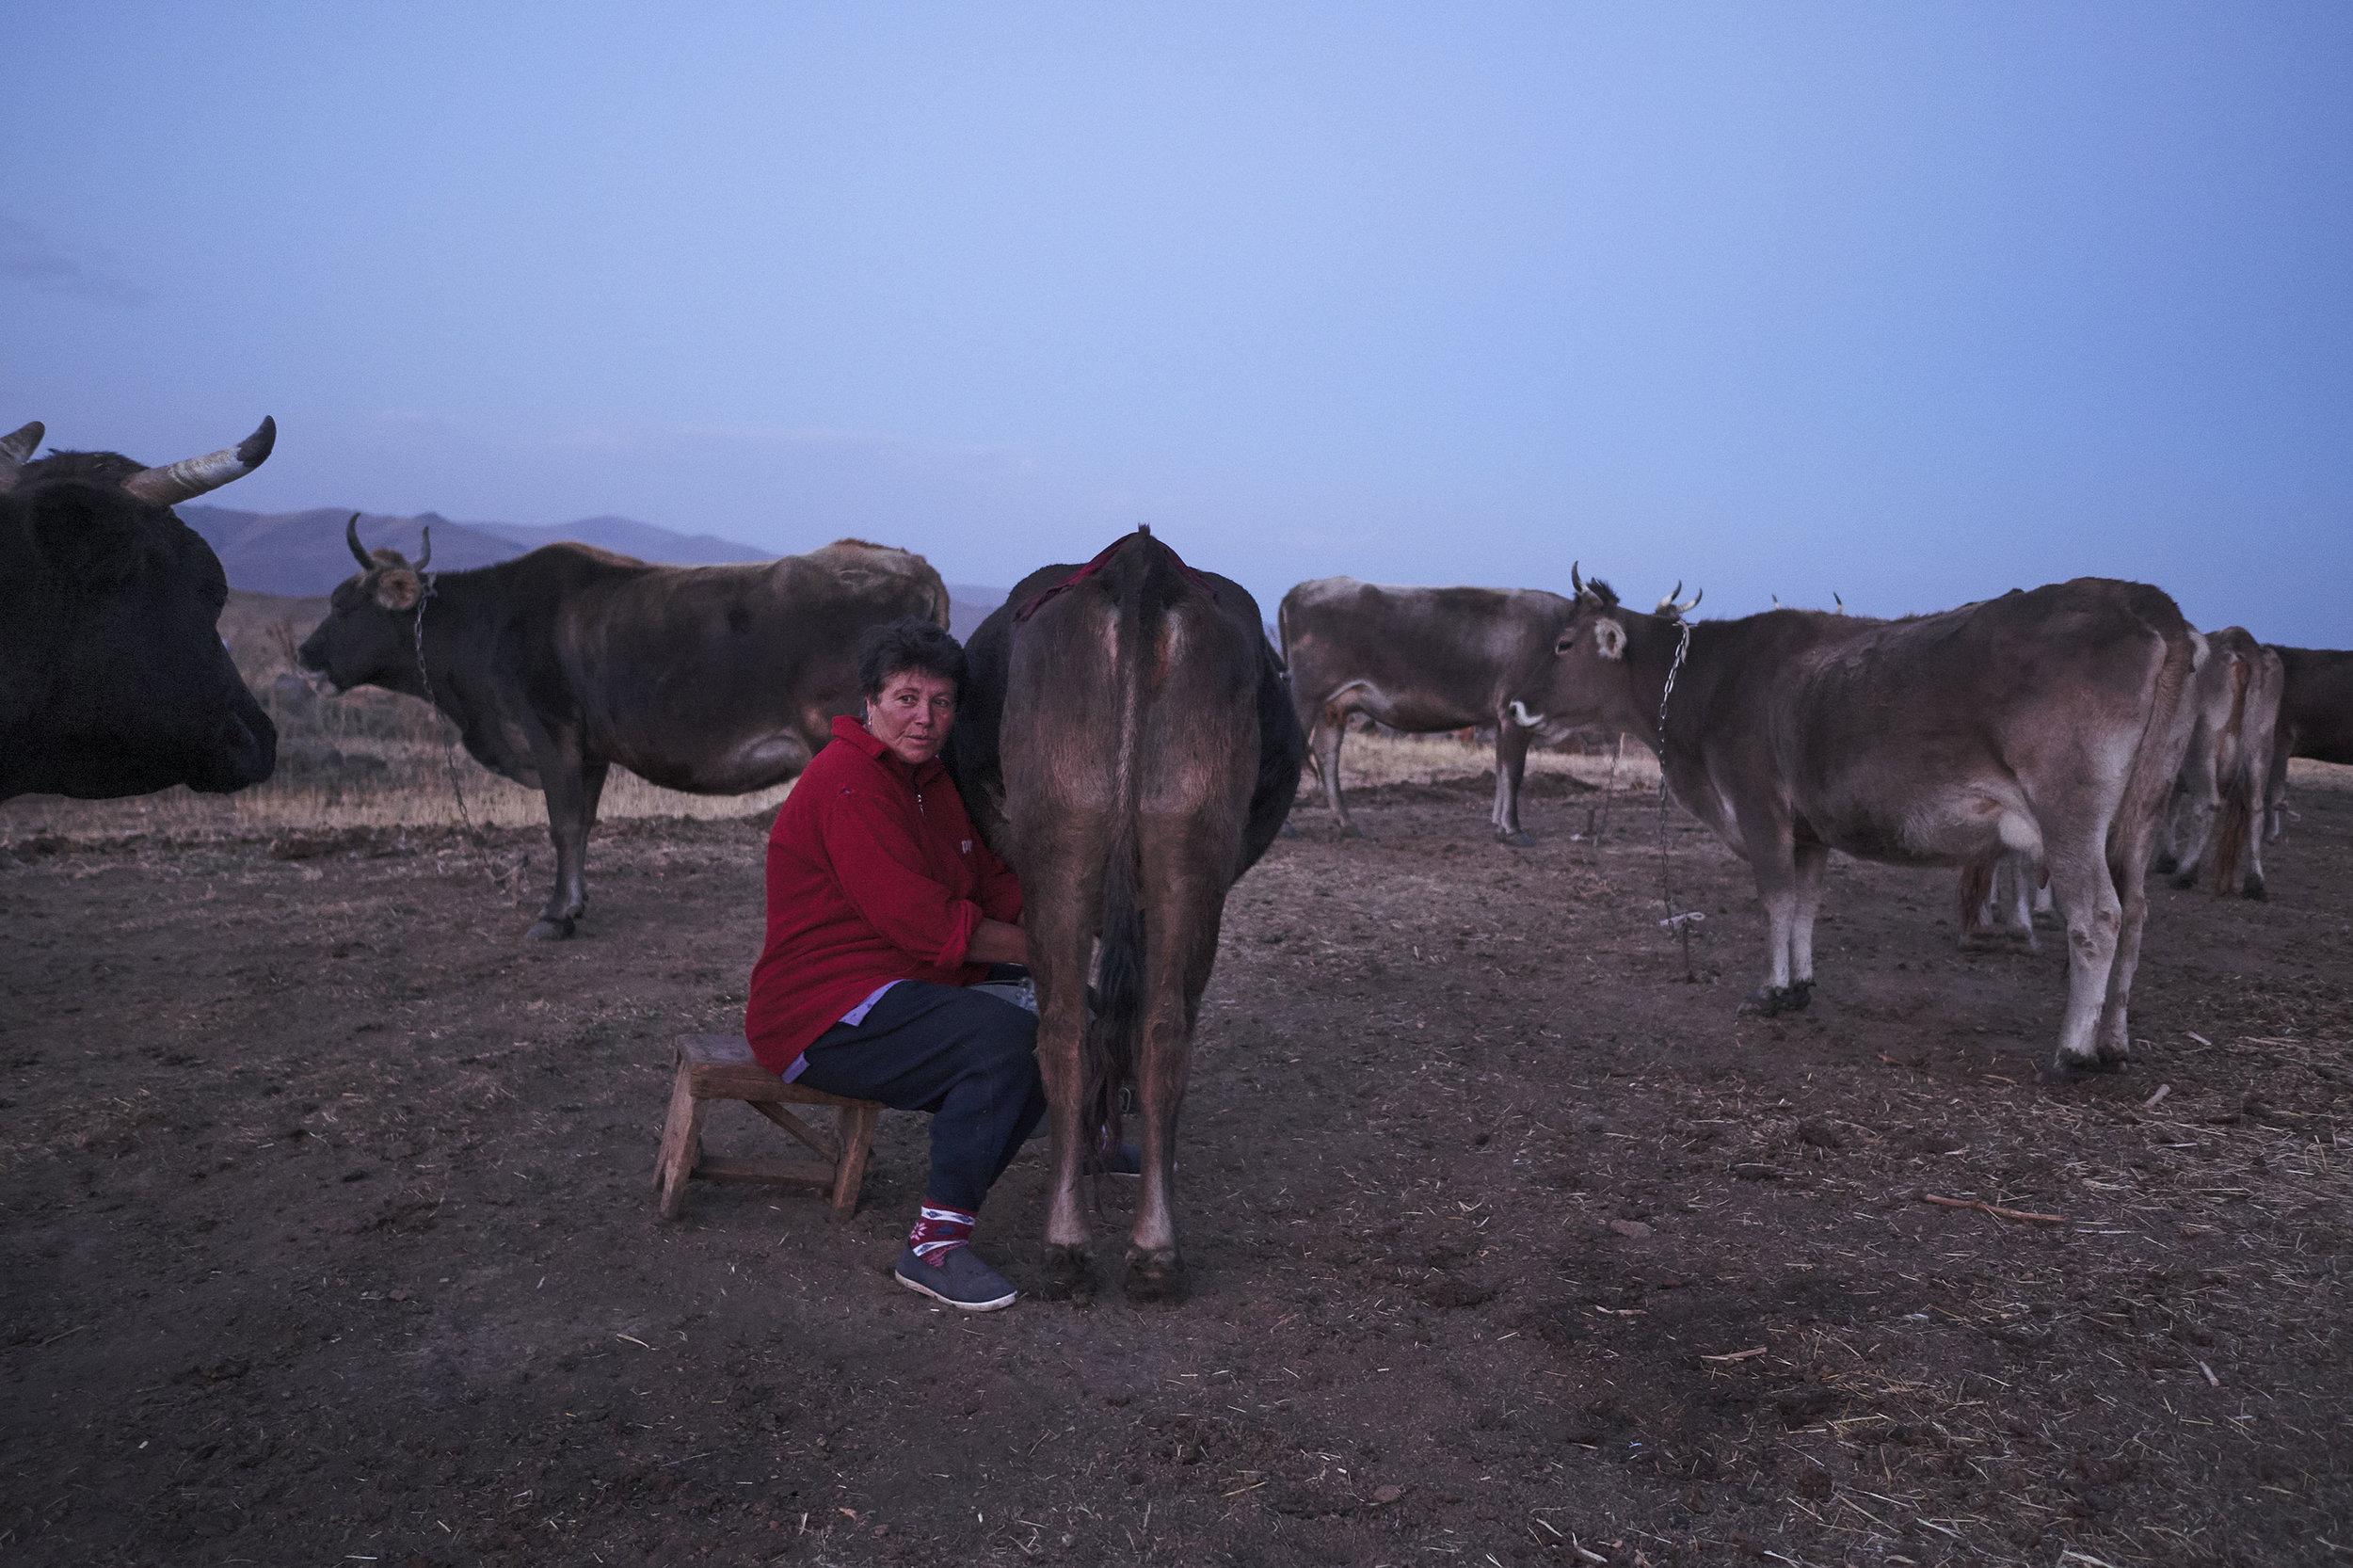 Armenia-Vayots-Sar-woman-milking-cows